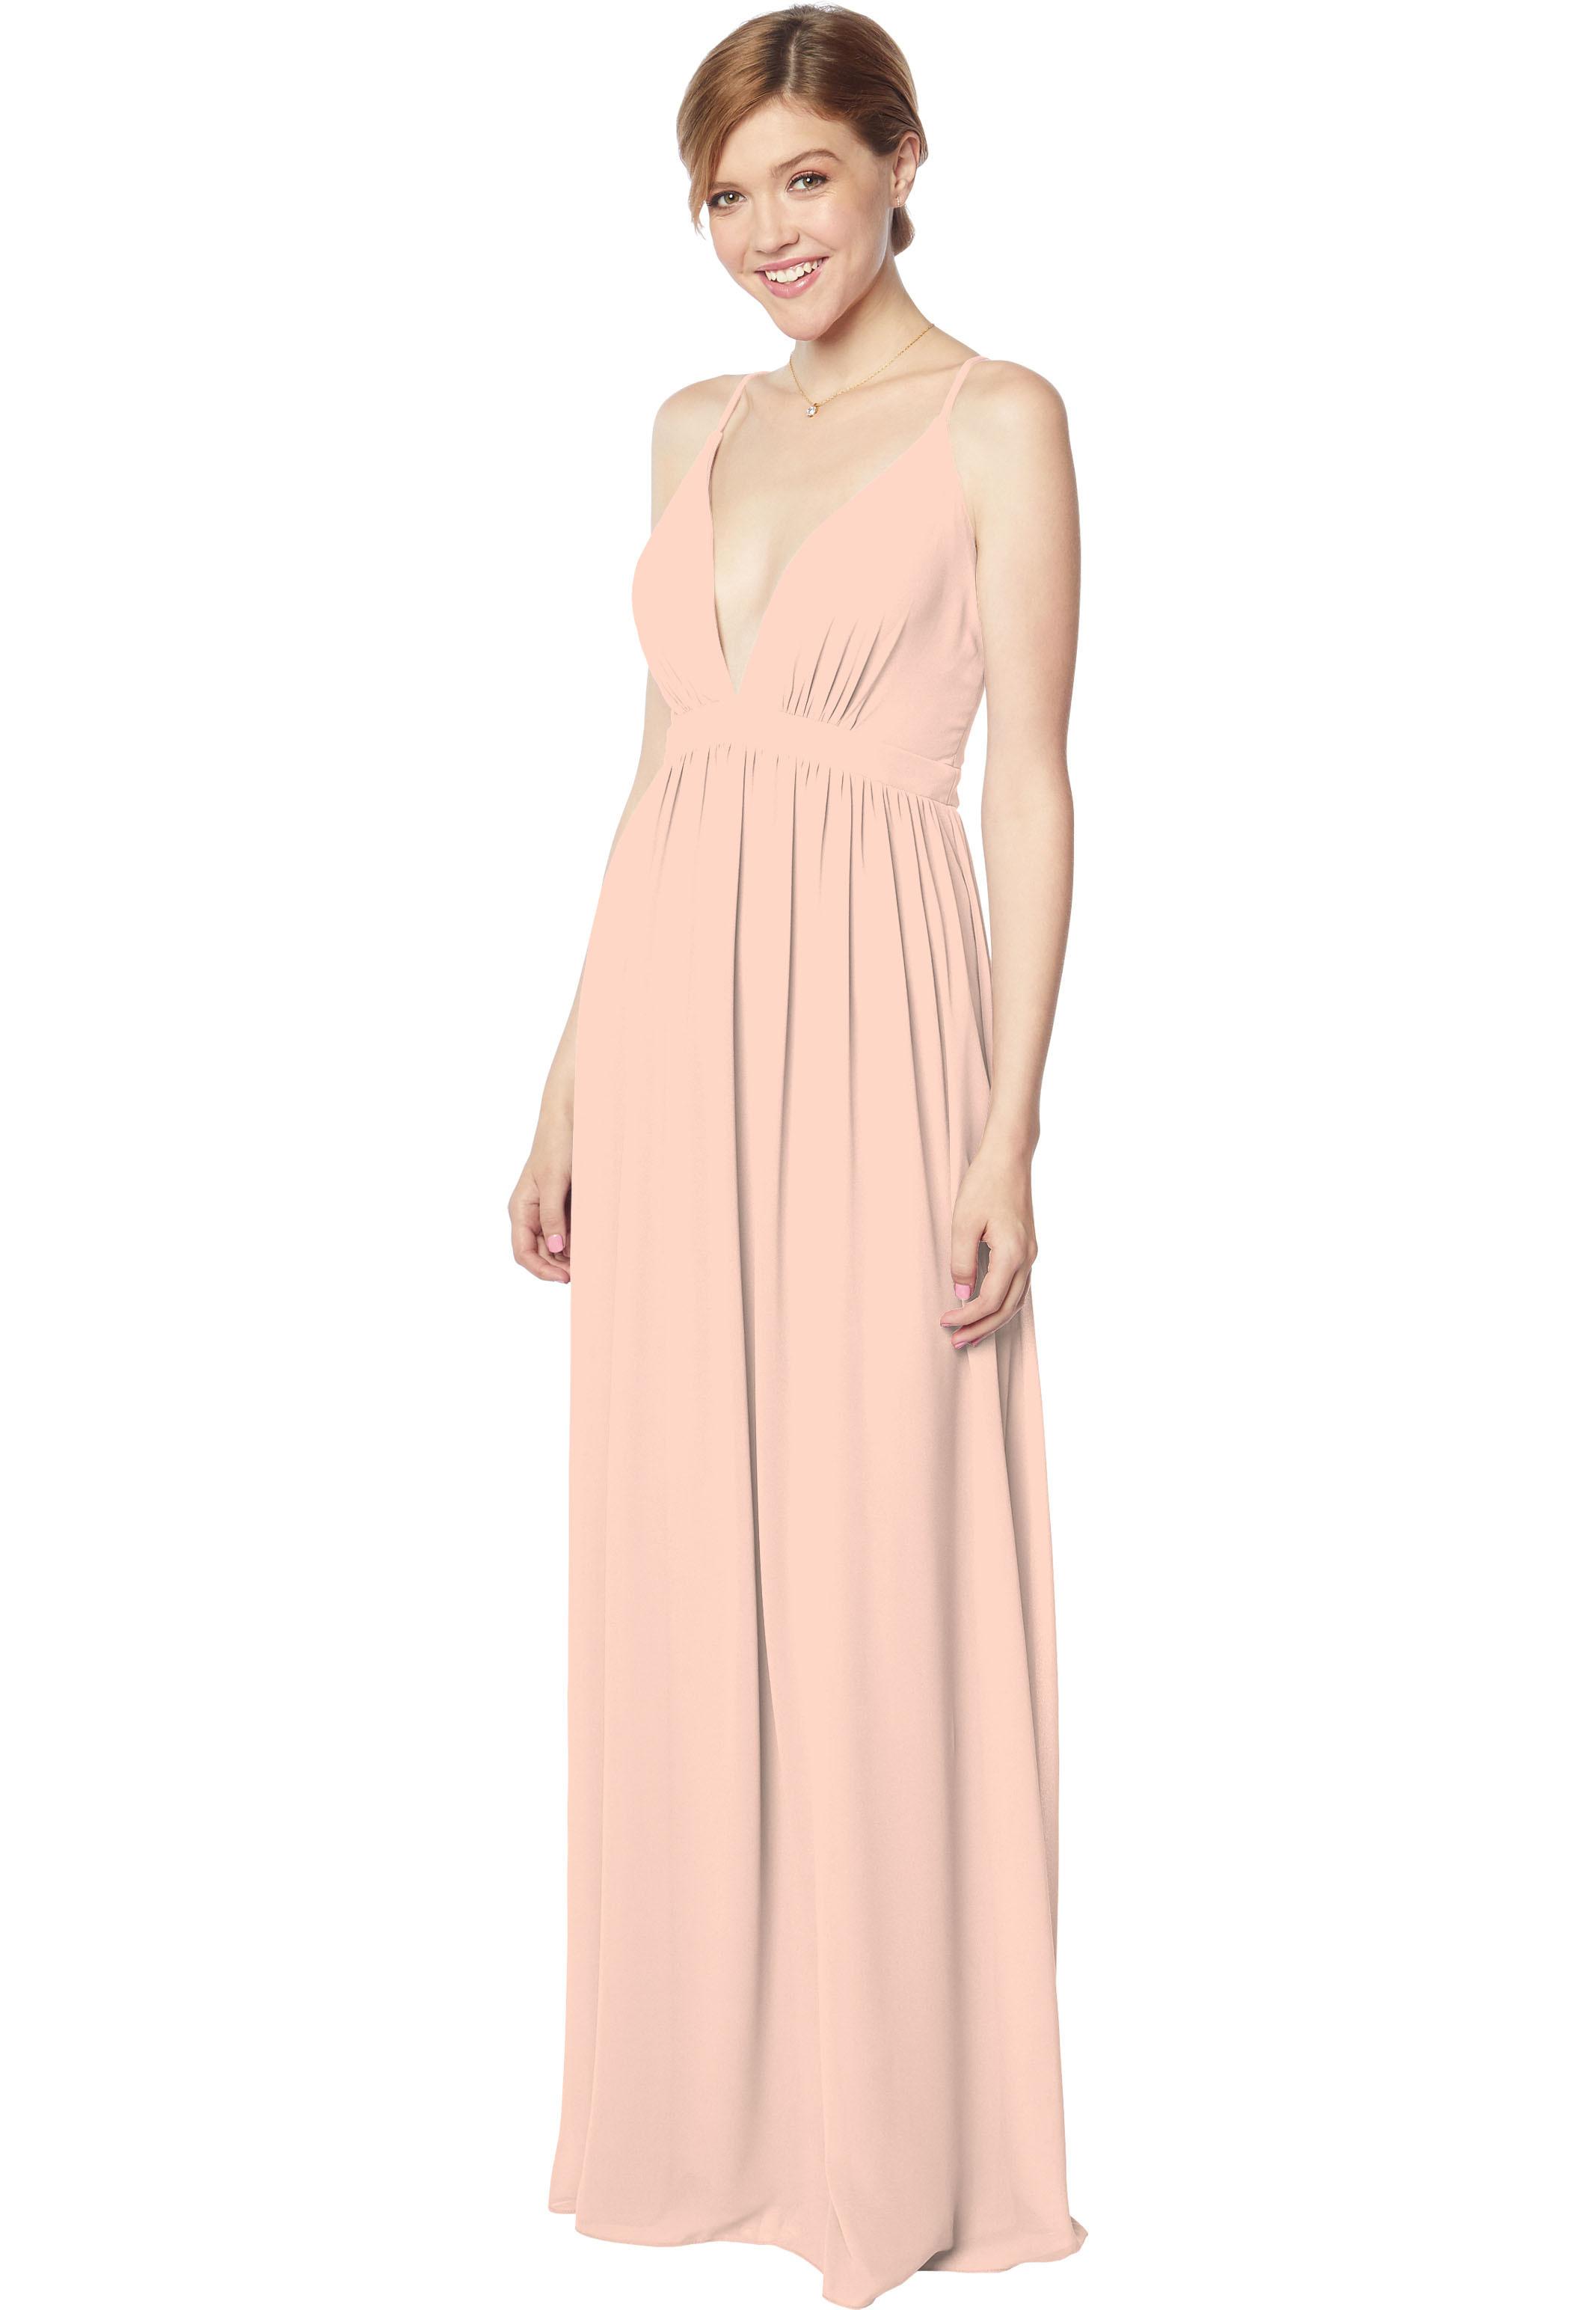 Bill Levkoff PETAL PINK Chiffon V-neck A-line gown, $170.00 Front